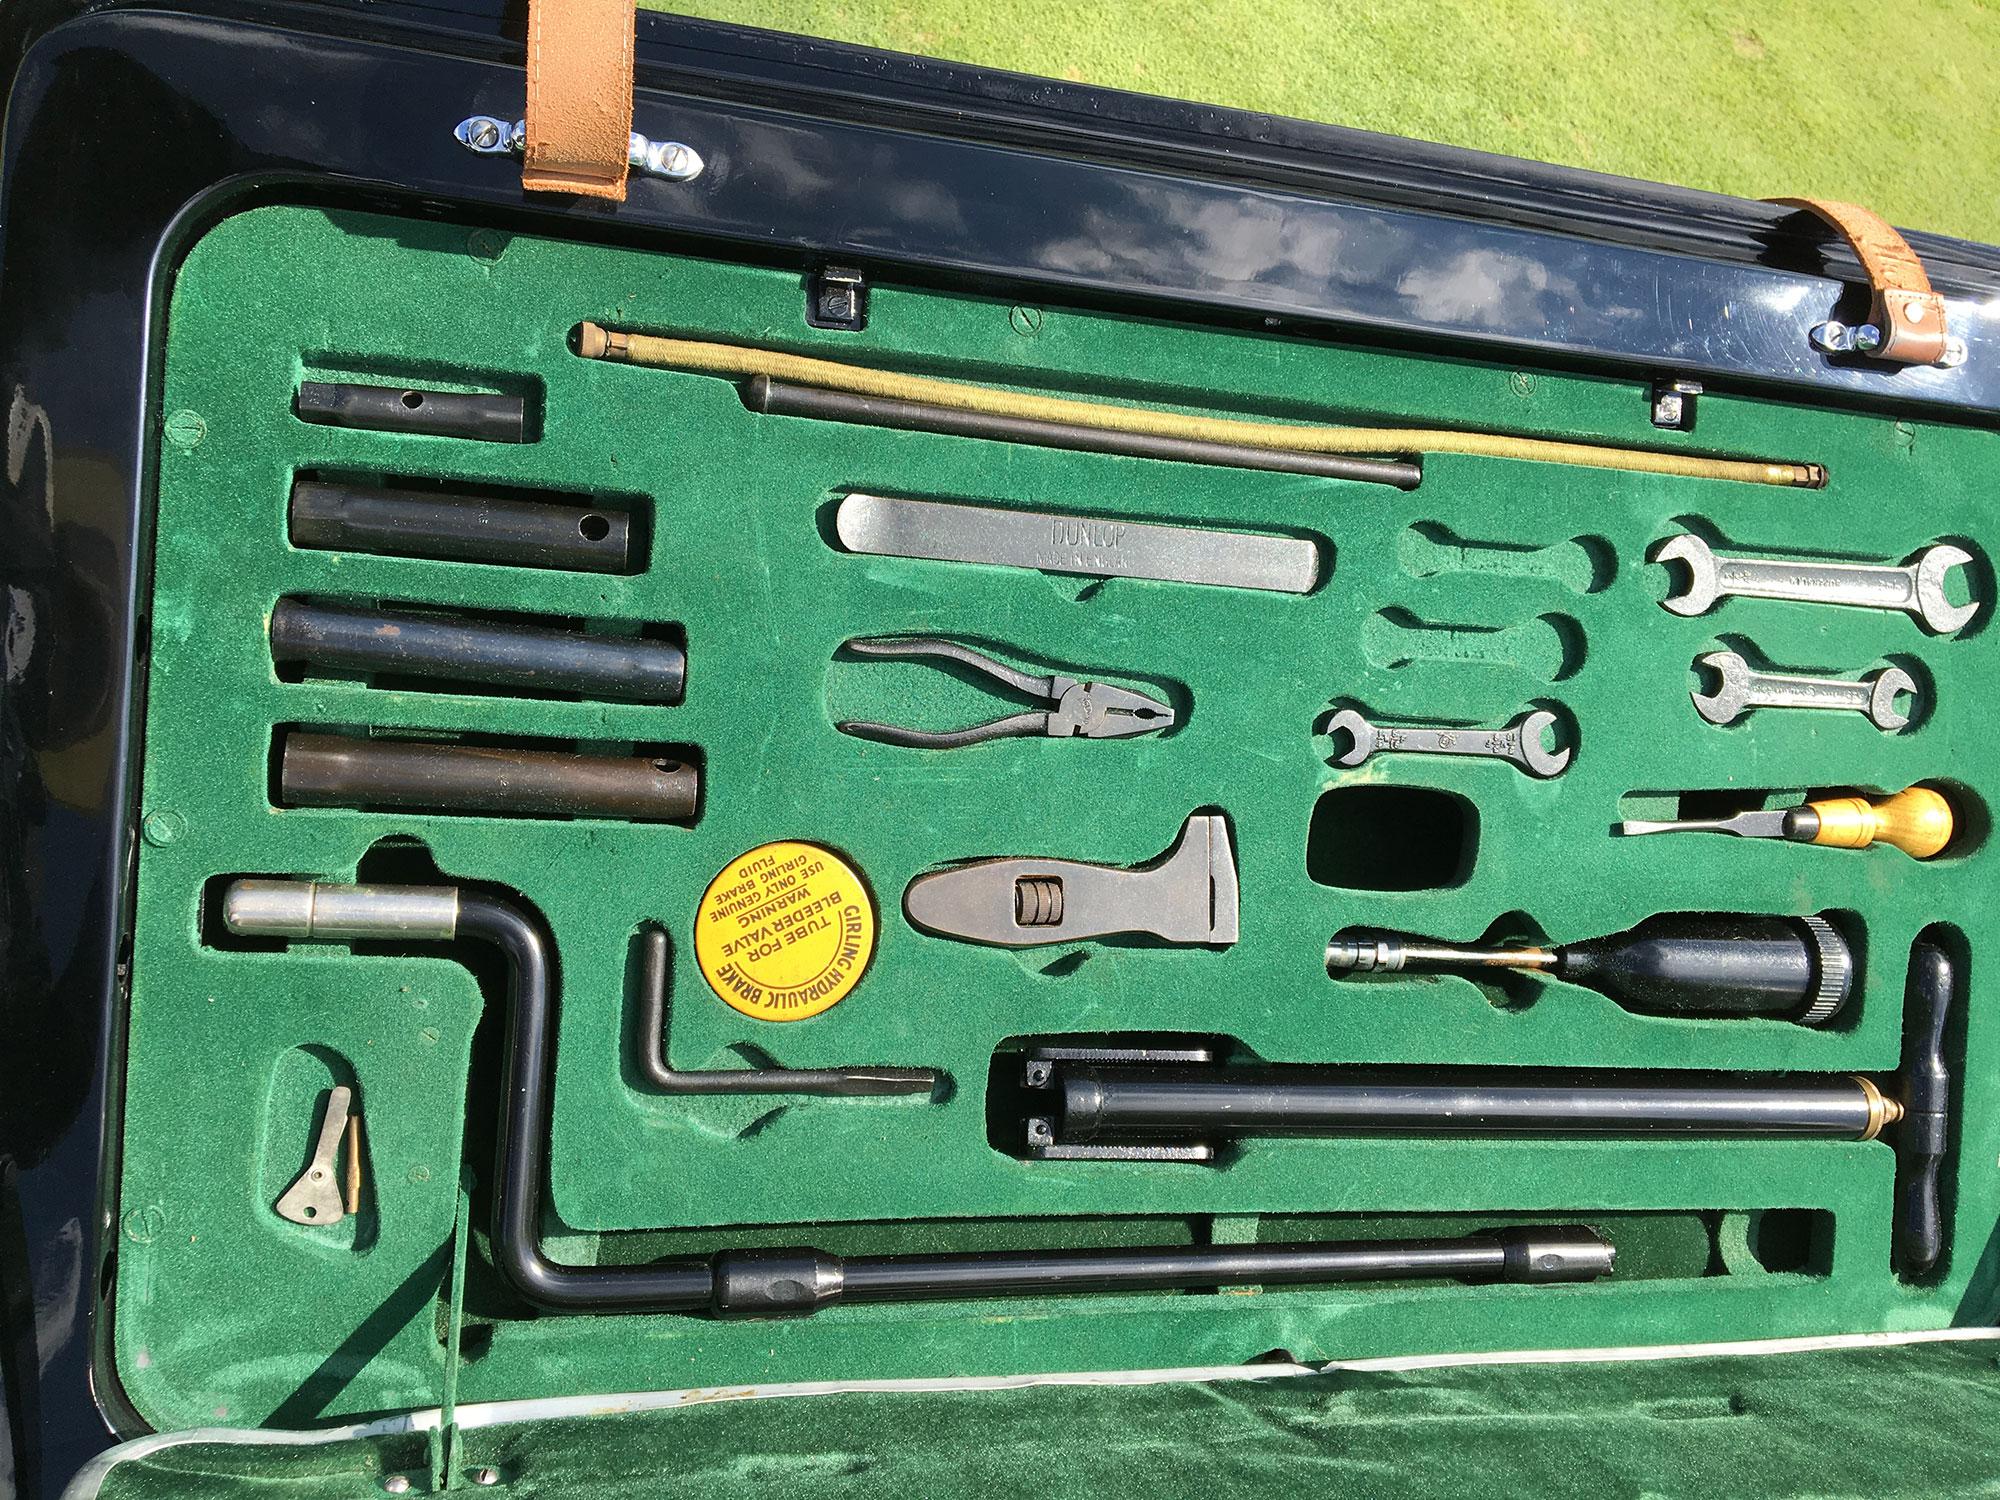 Jaguar mark v mkv tool kit